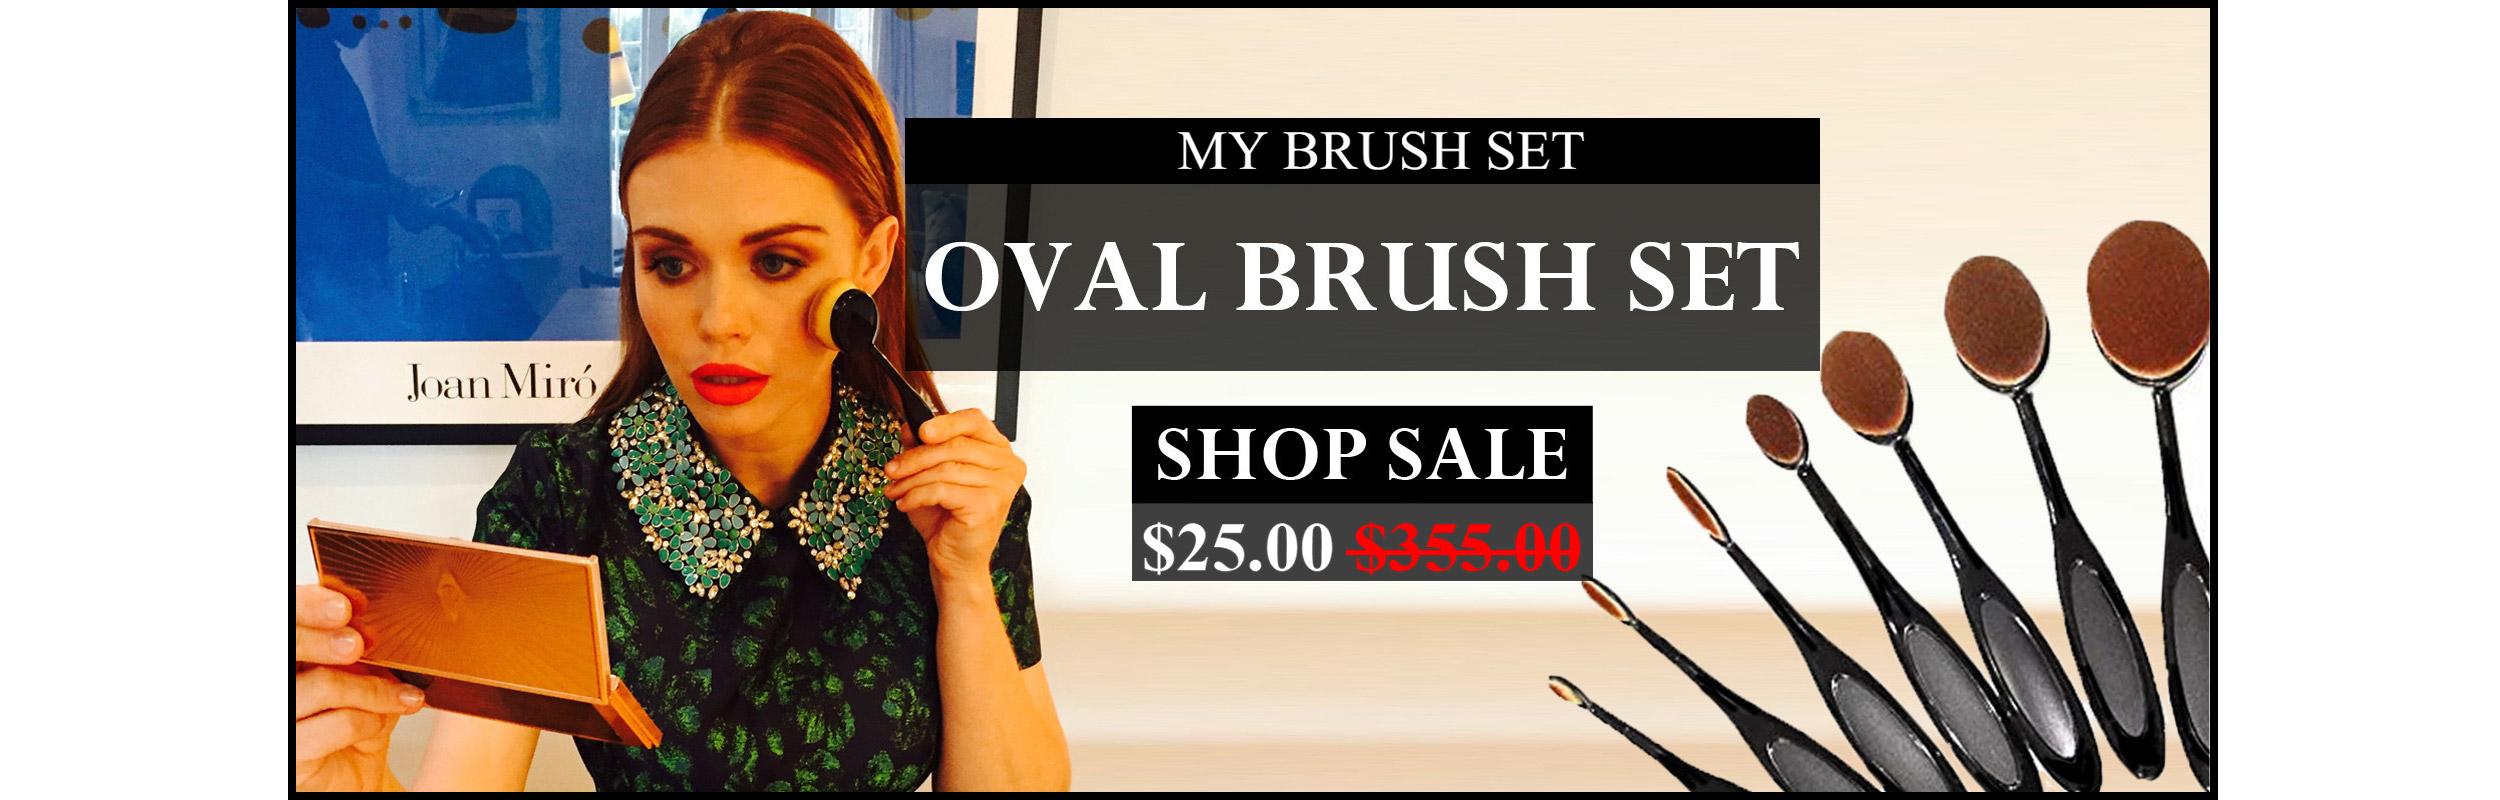 Oval Brush Set Sale